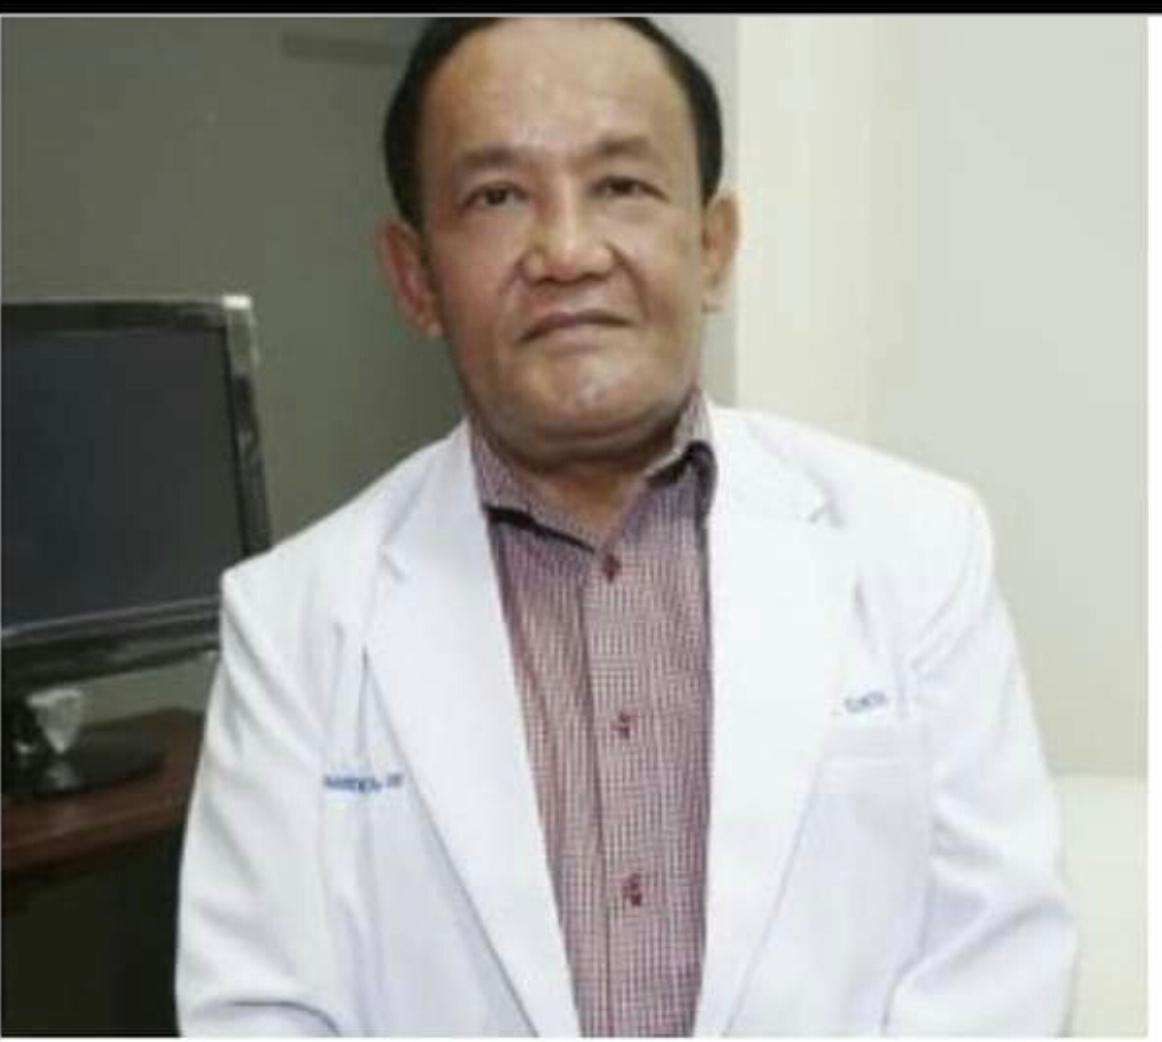 Dokter RSUD Arifin Achmad Meninggal Dunia Akibat Corona